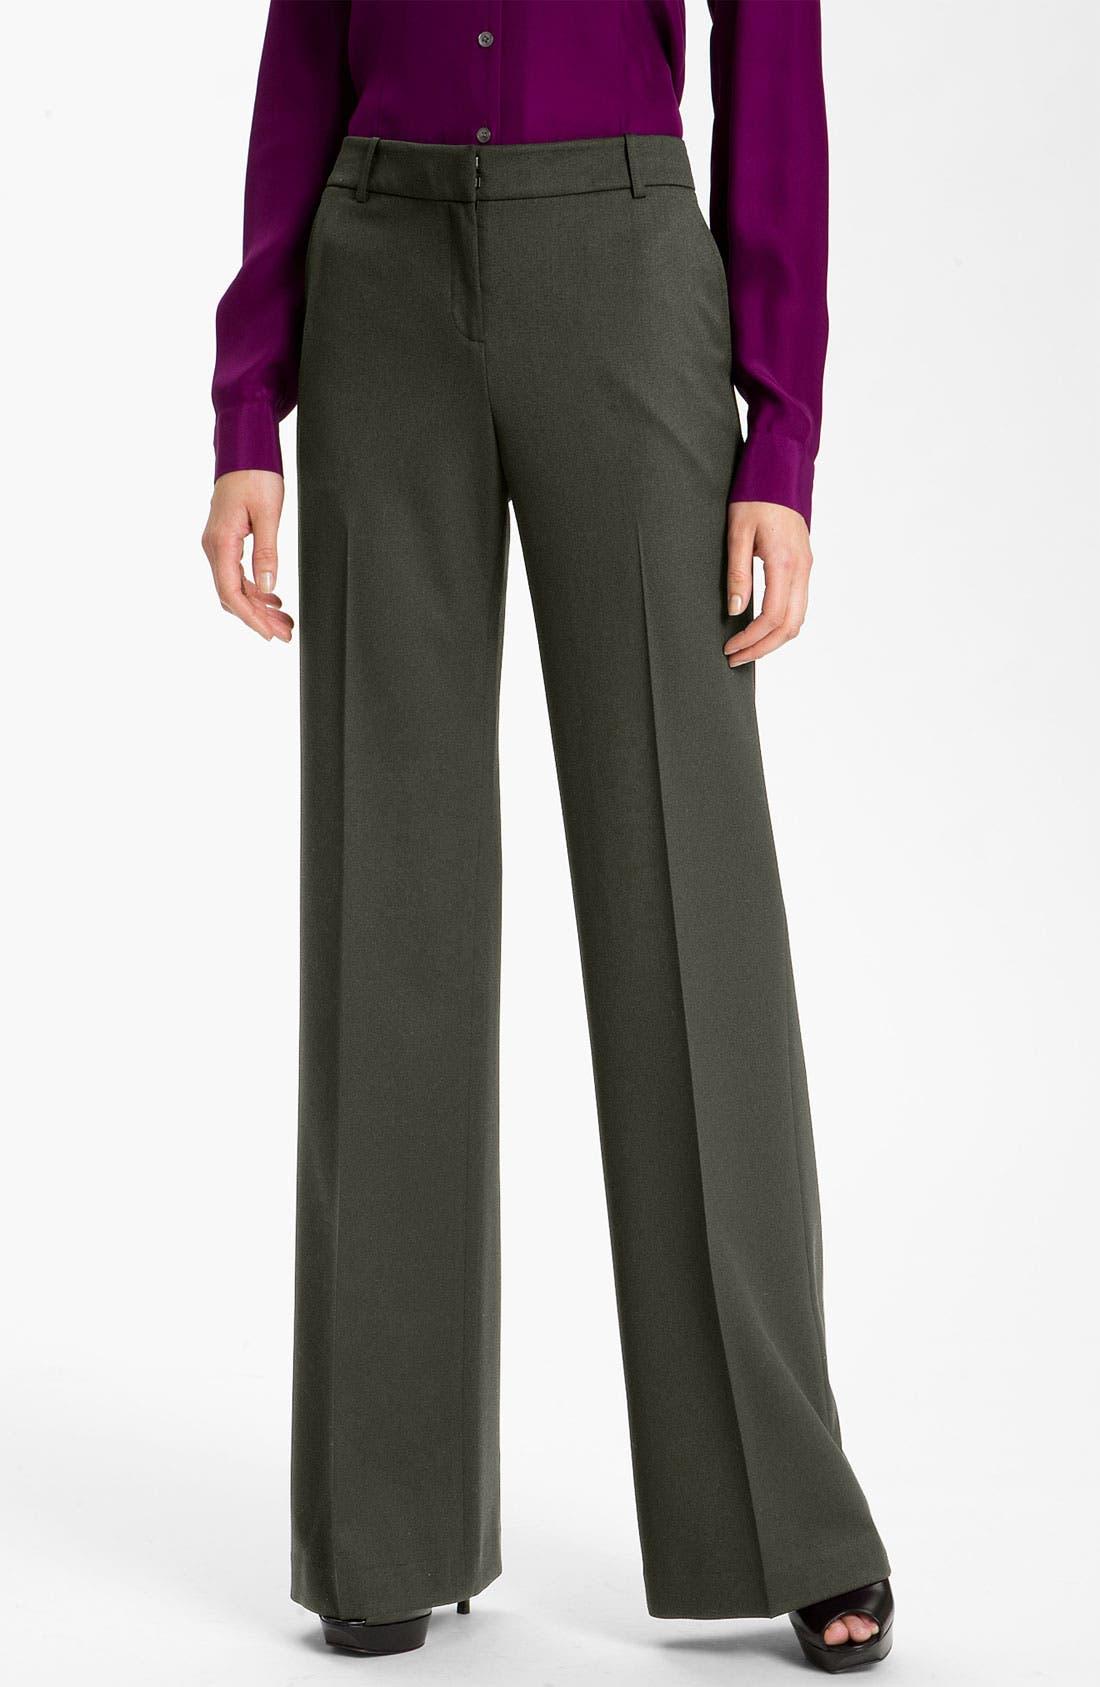 Alternate Image 1 Selected - Lafayette 148 New York Stretch Wool Pants (Petite)